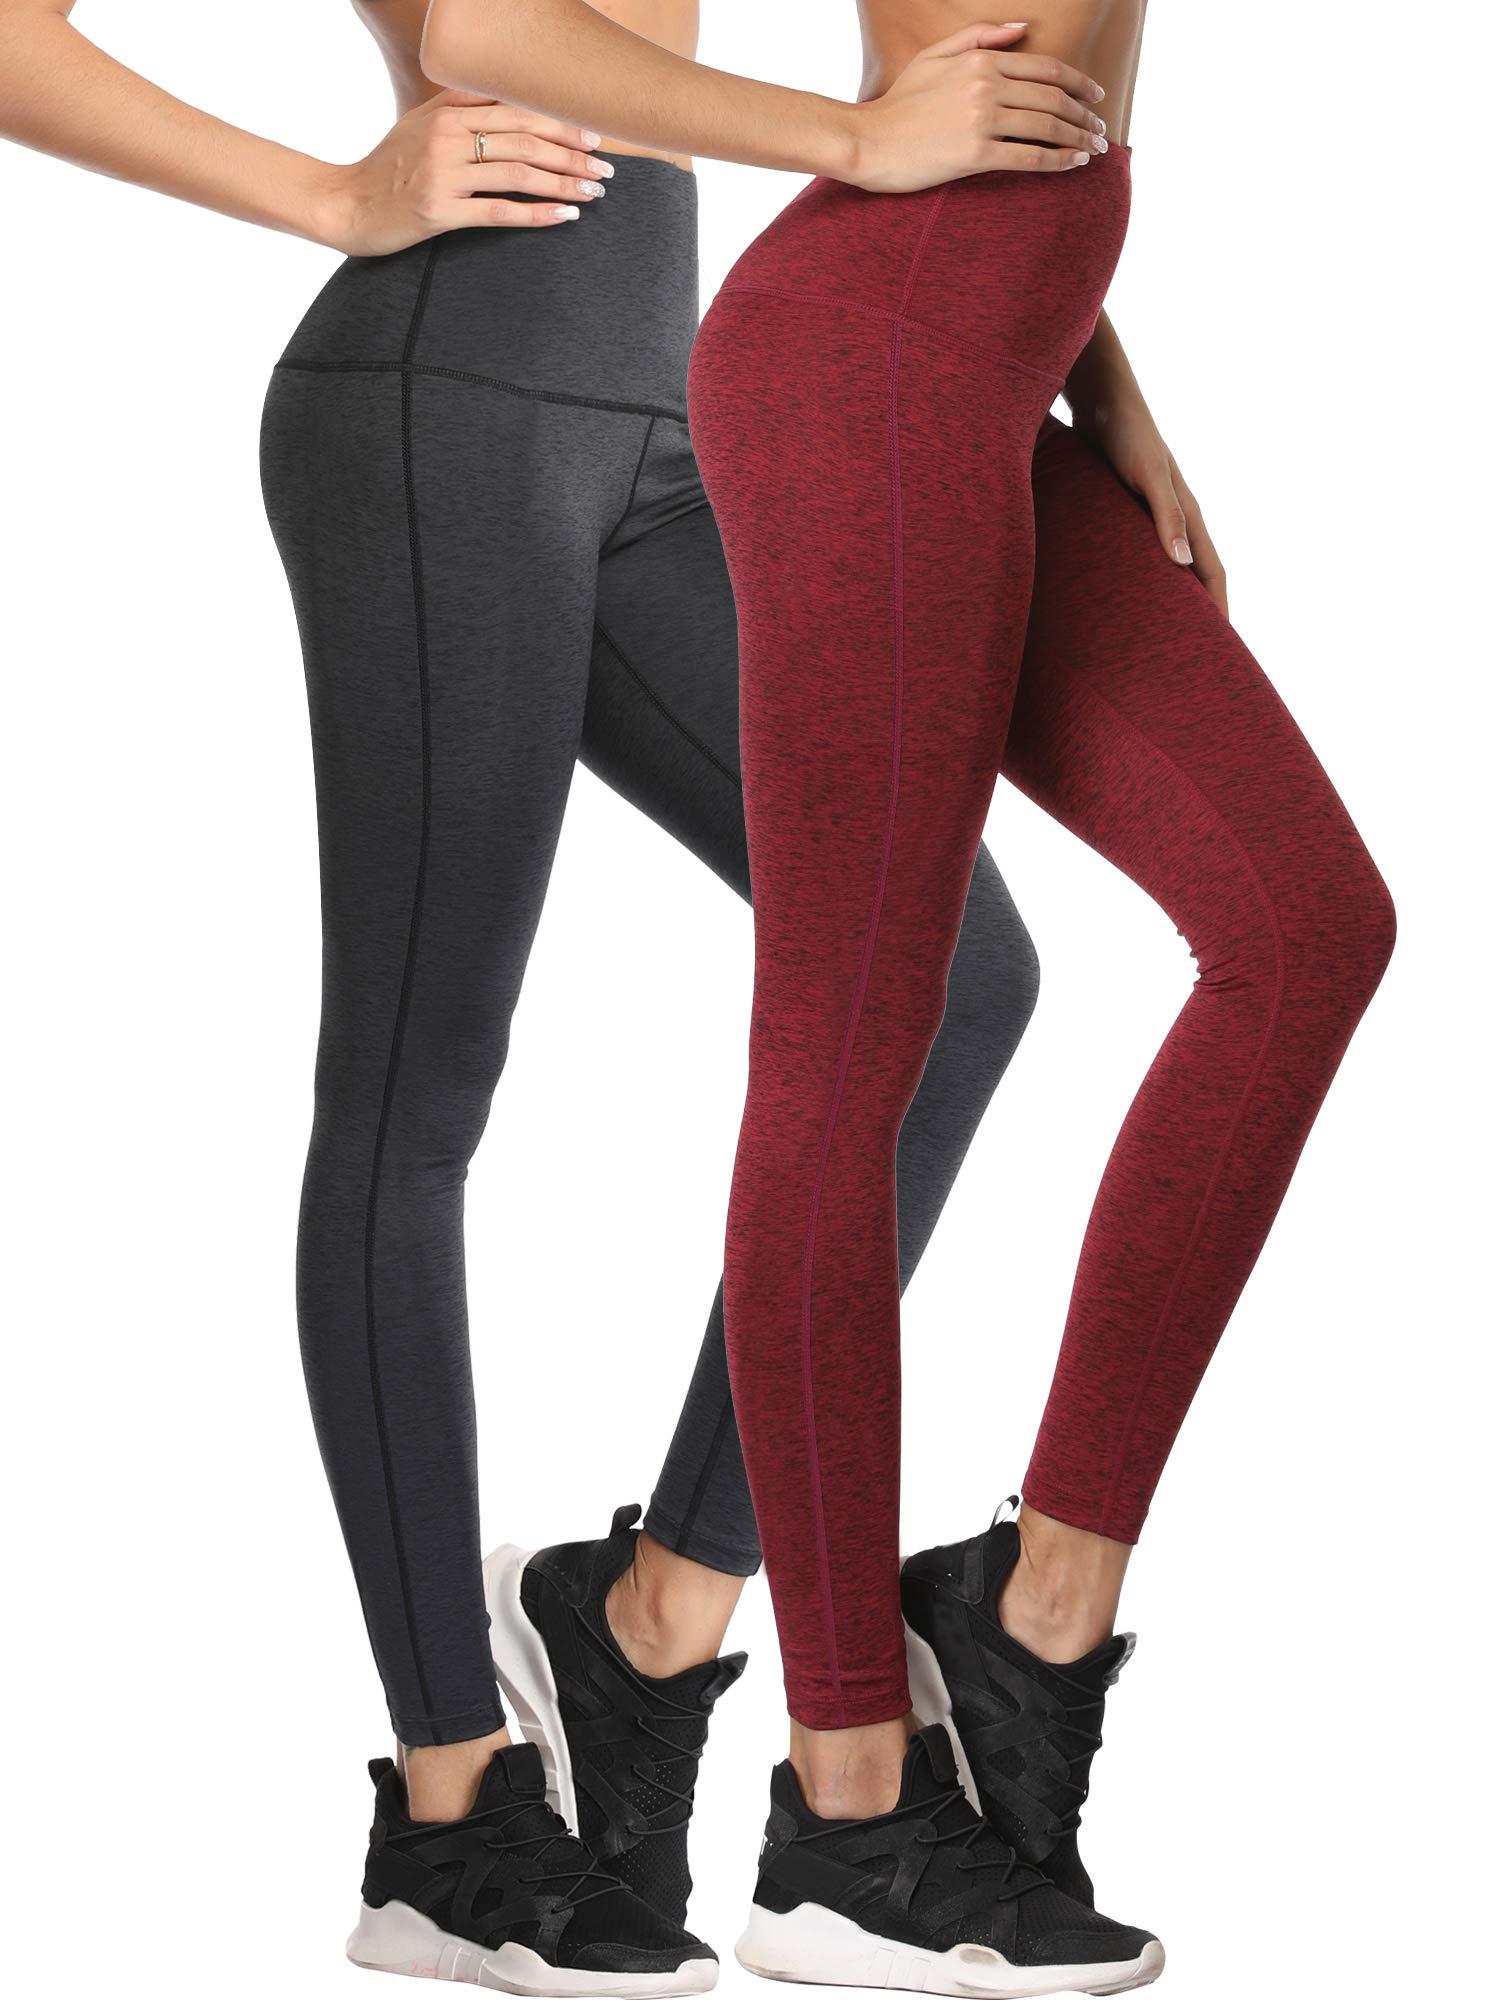 Cadmus Tummy Control Workout Leggings for Yoga Womens,1101,Dark Grey & Wine Red,Small